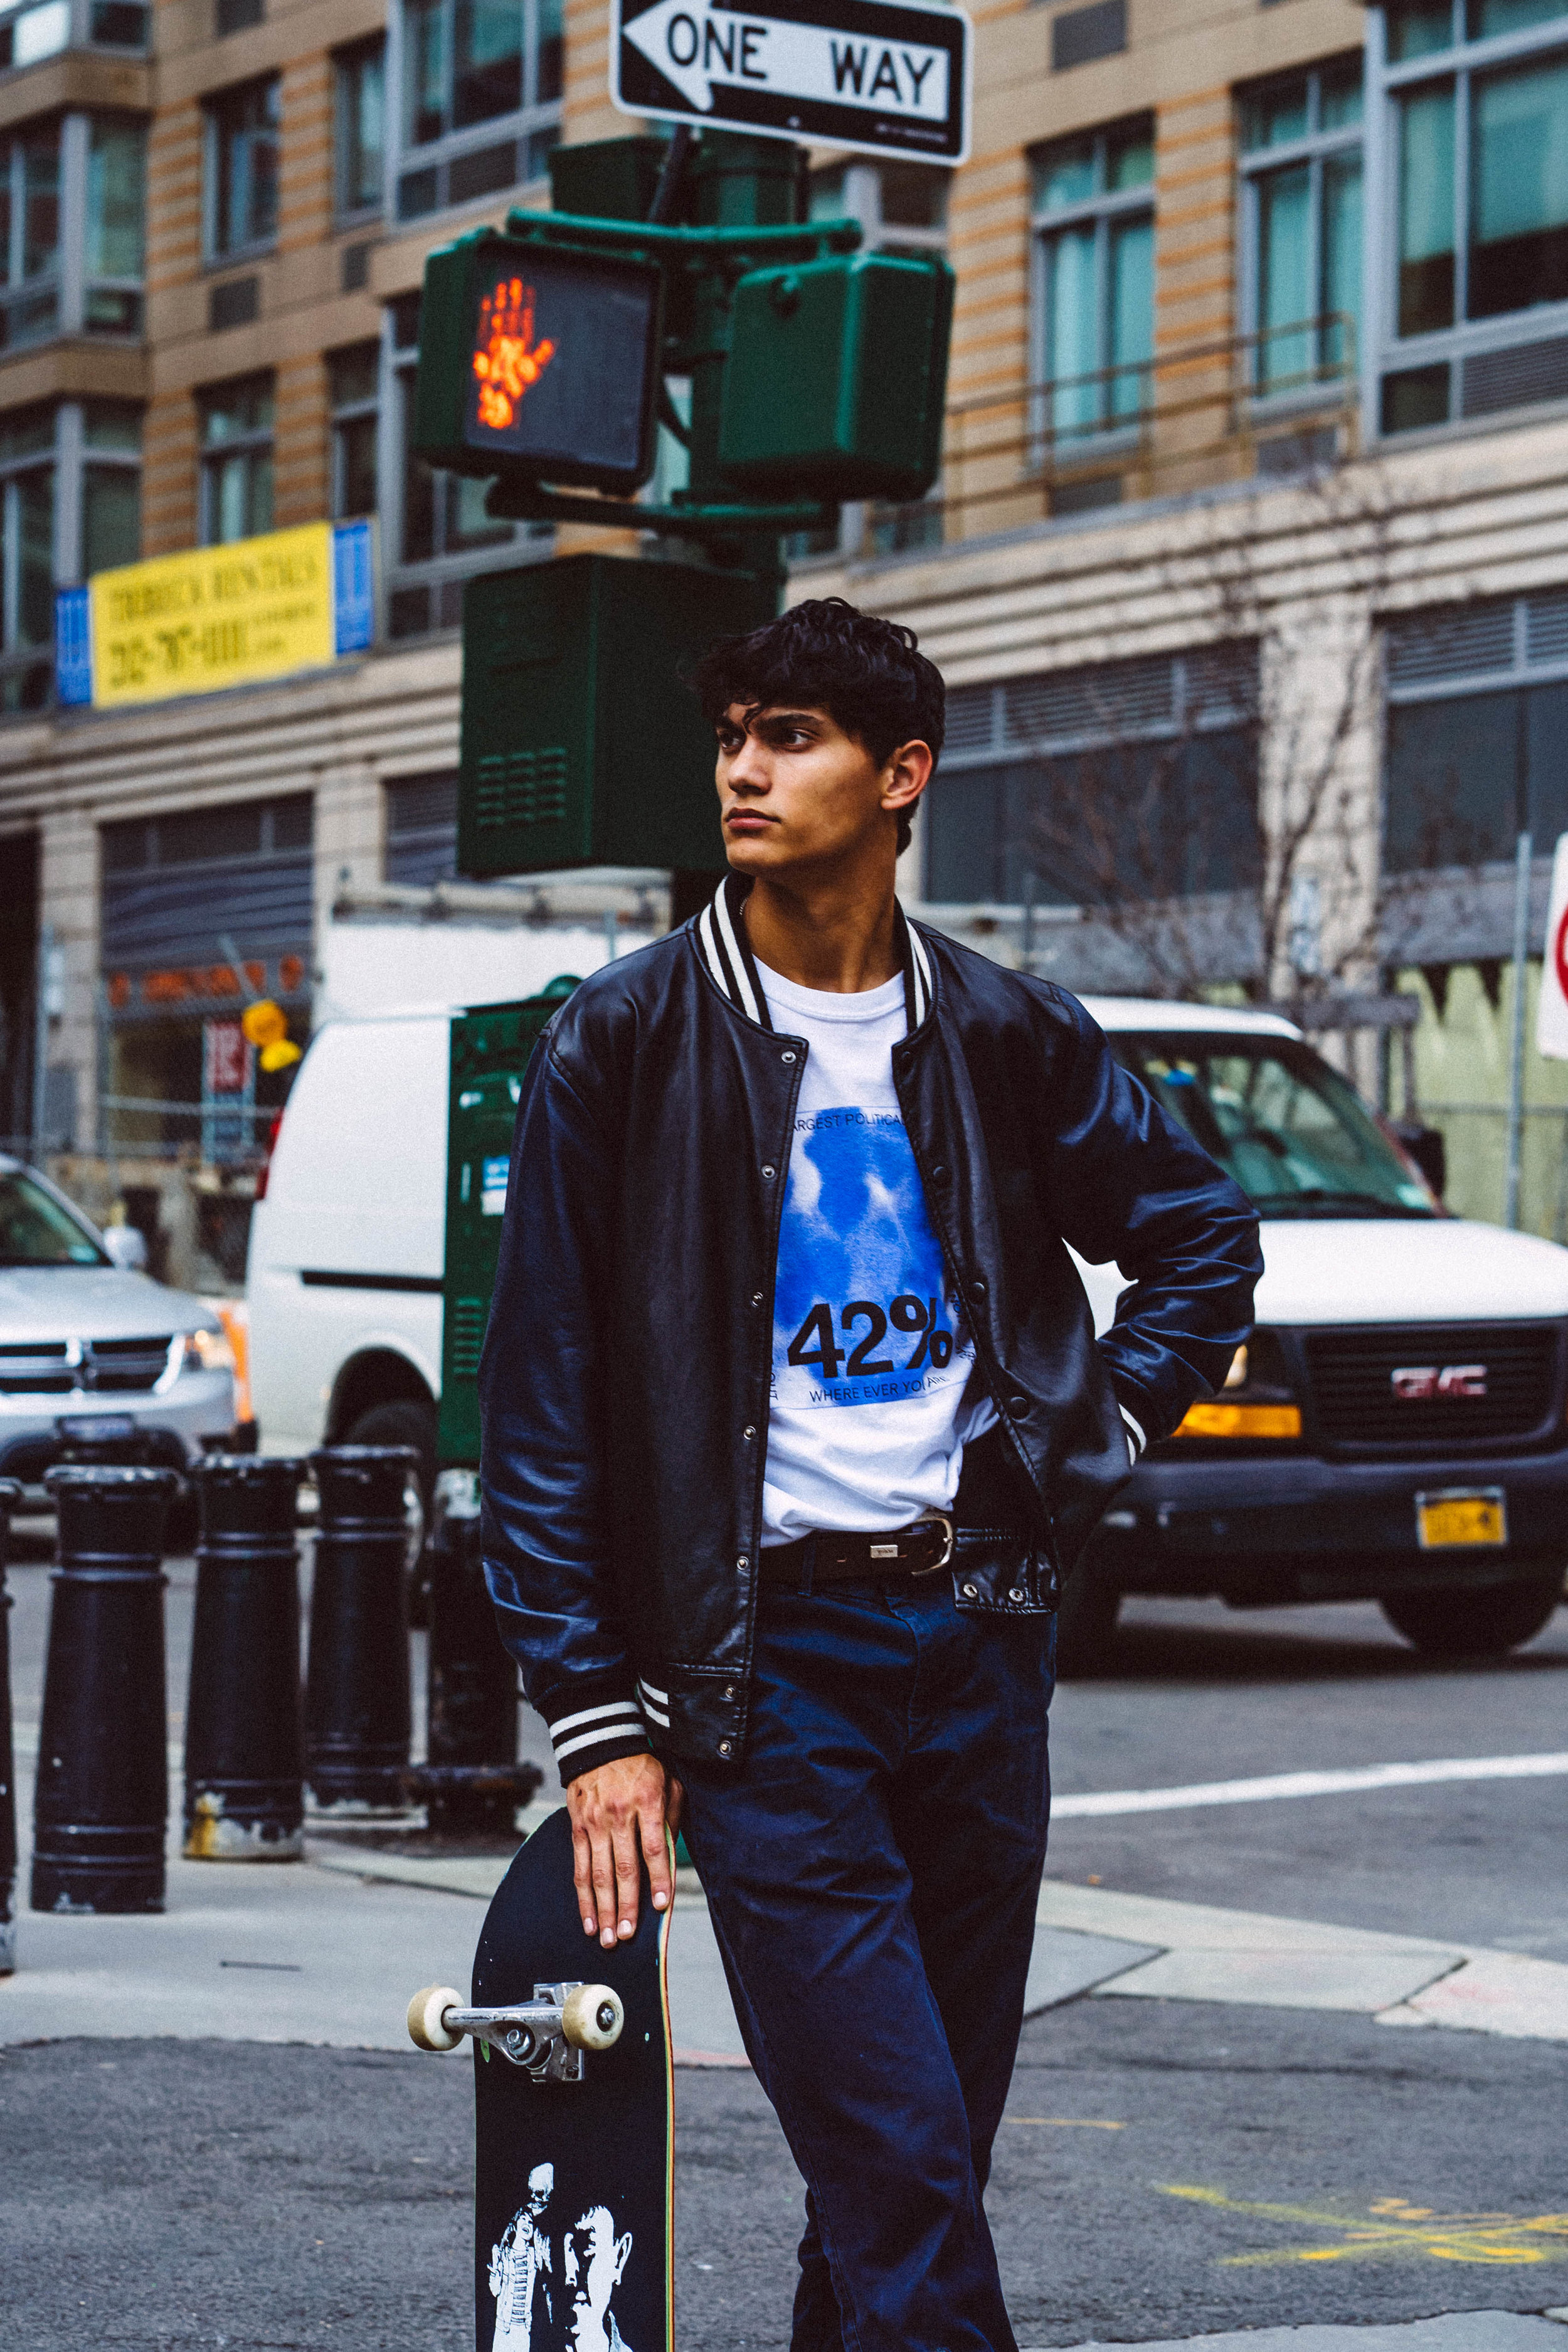 newyork-sony-102376.jpg